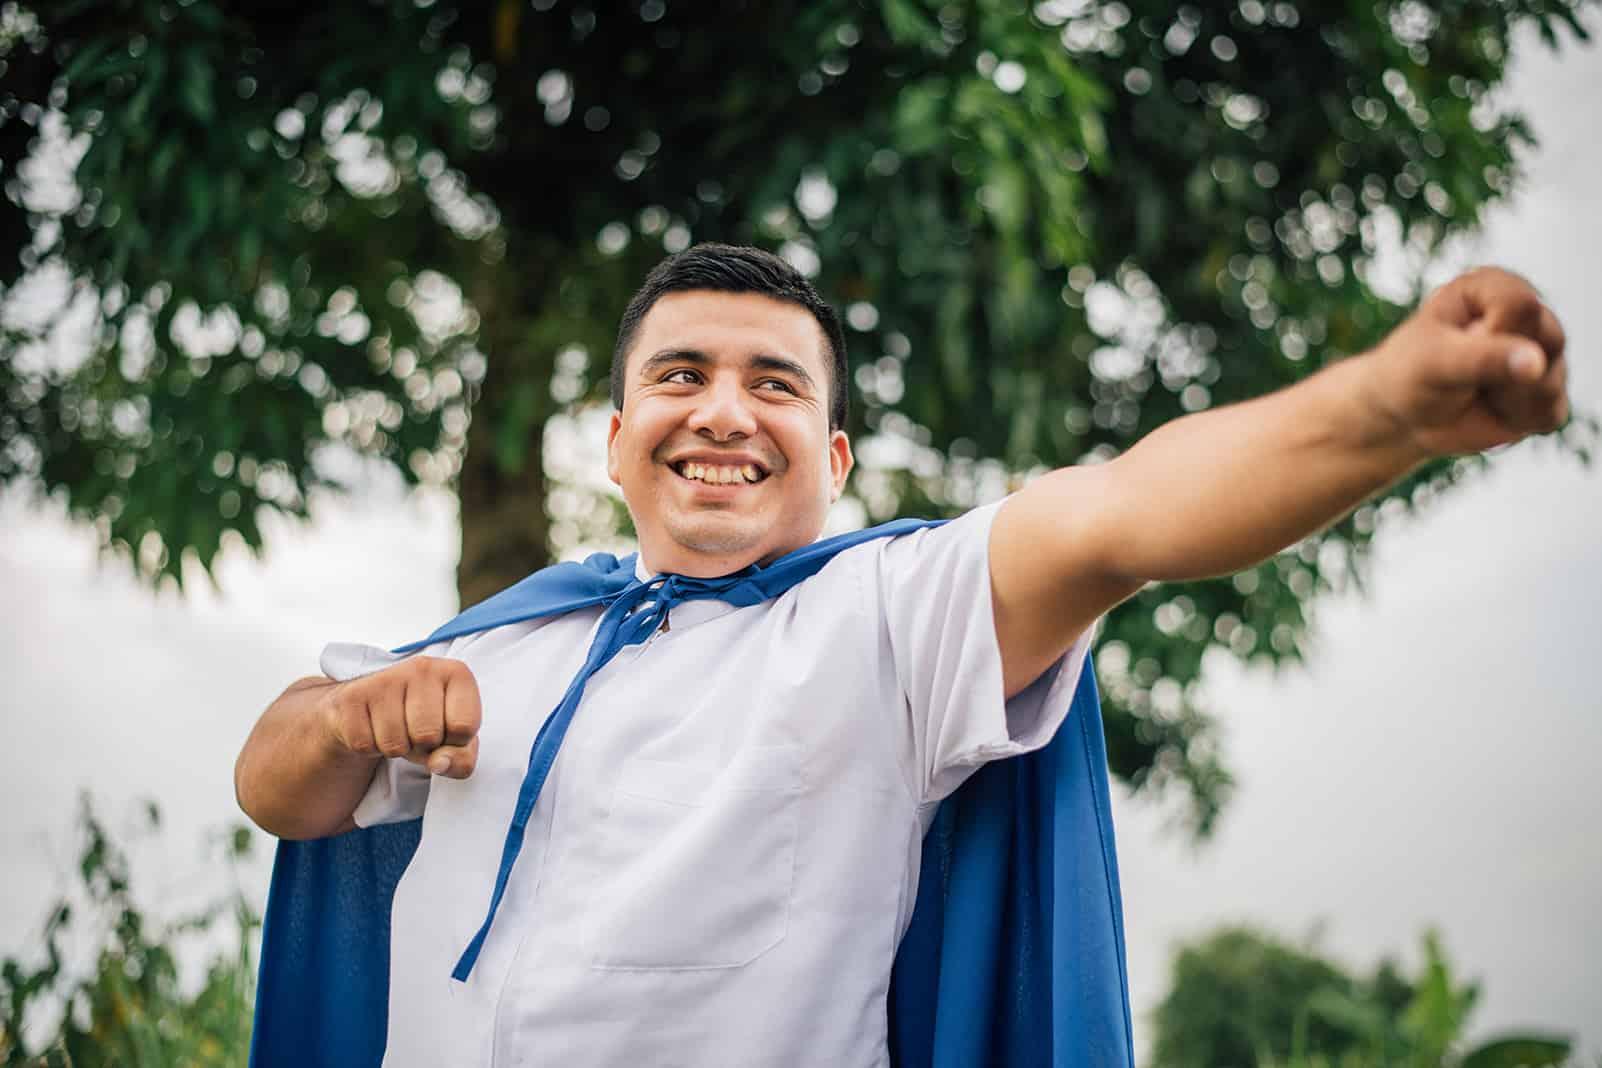 A man poses in a blue superhero cape